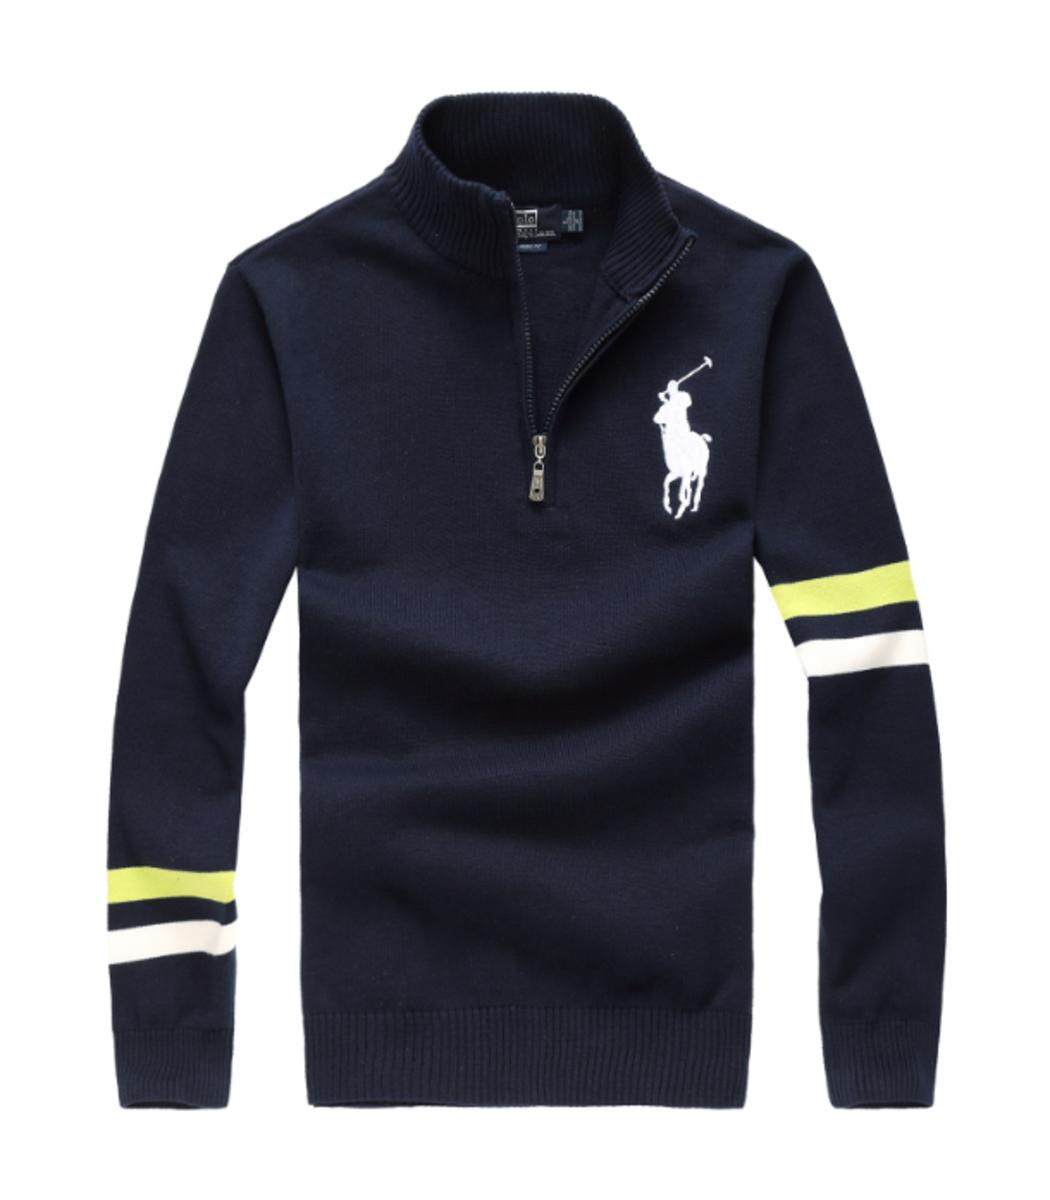 Темно-синий свитер POLO Ralph Lauren воротник стойка на молнии SR1